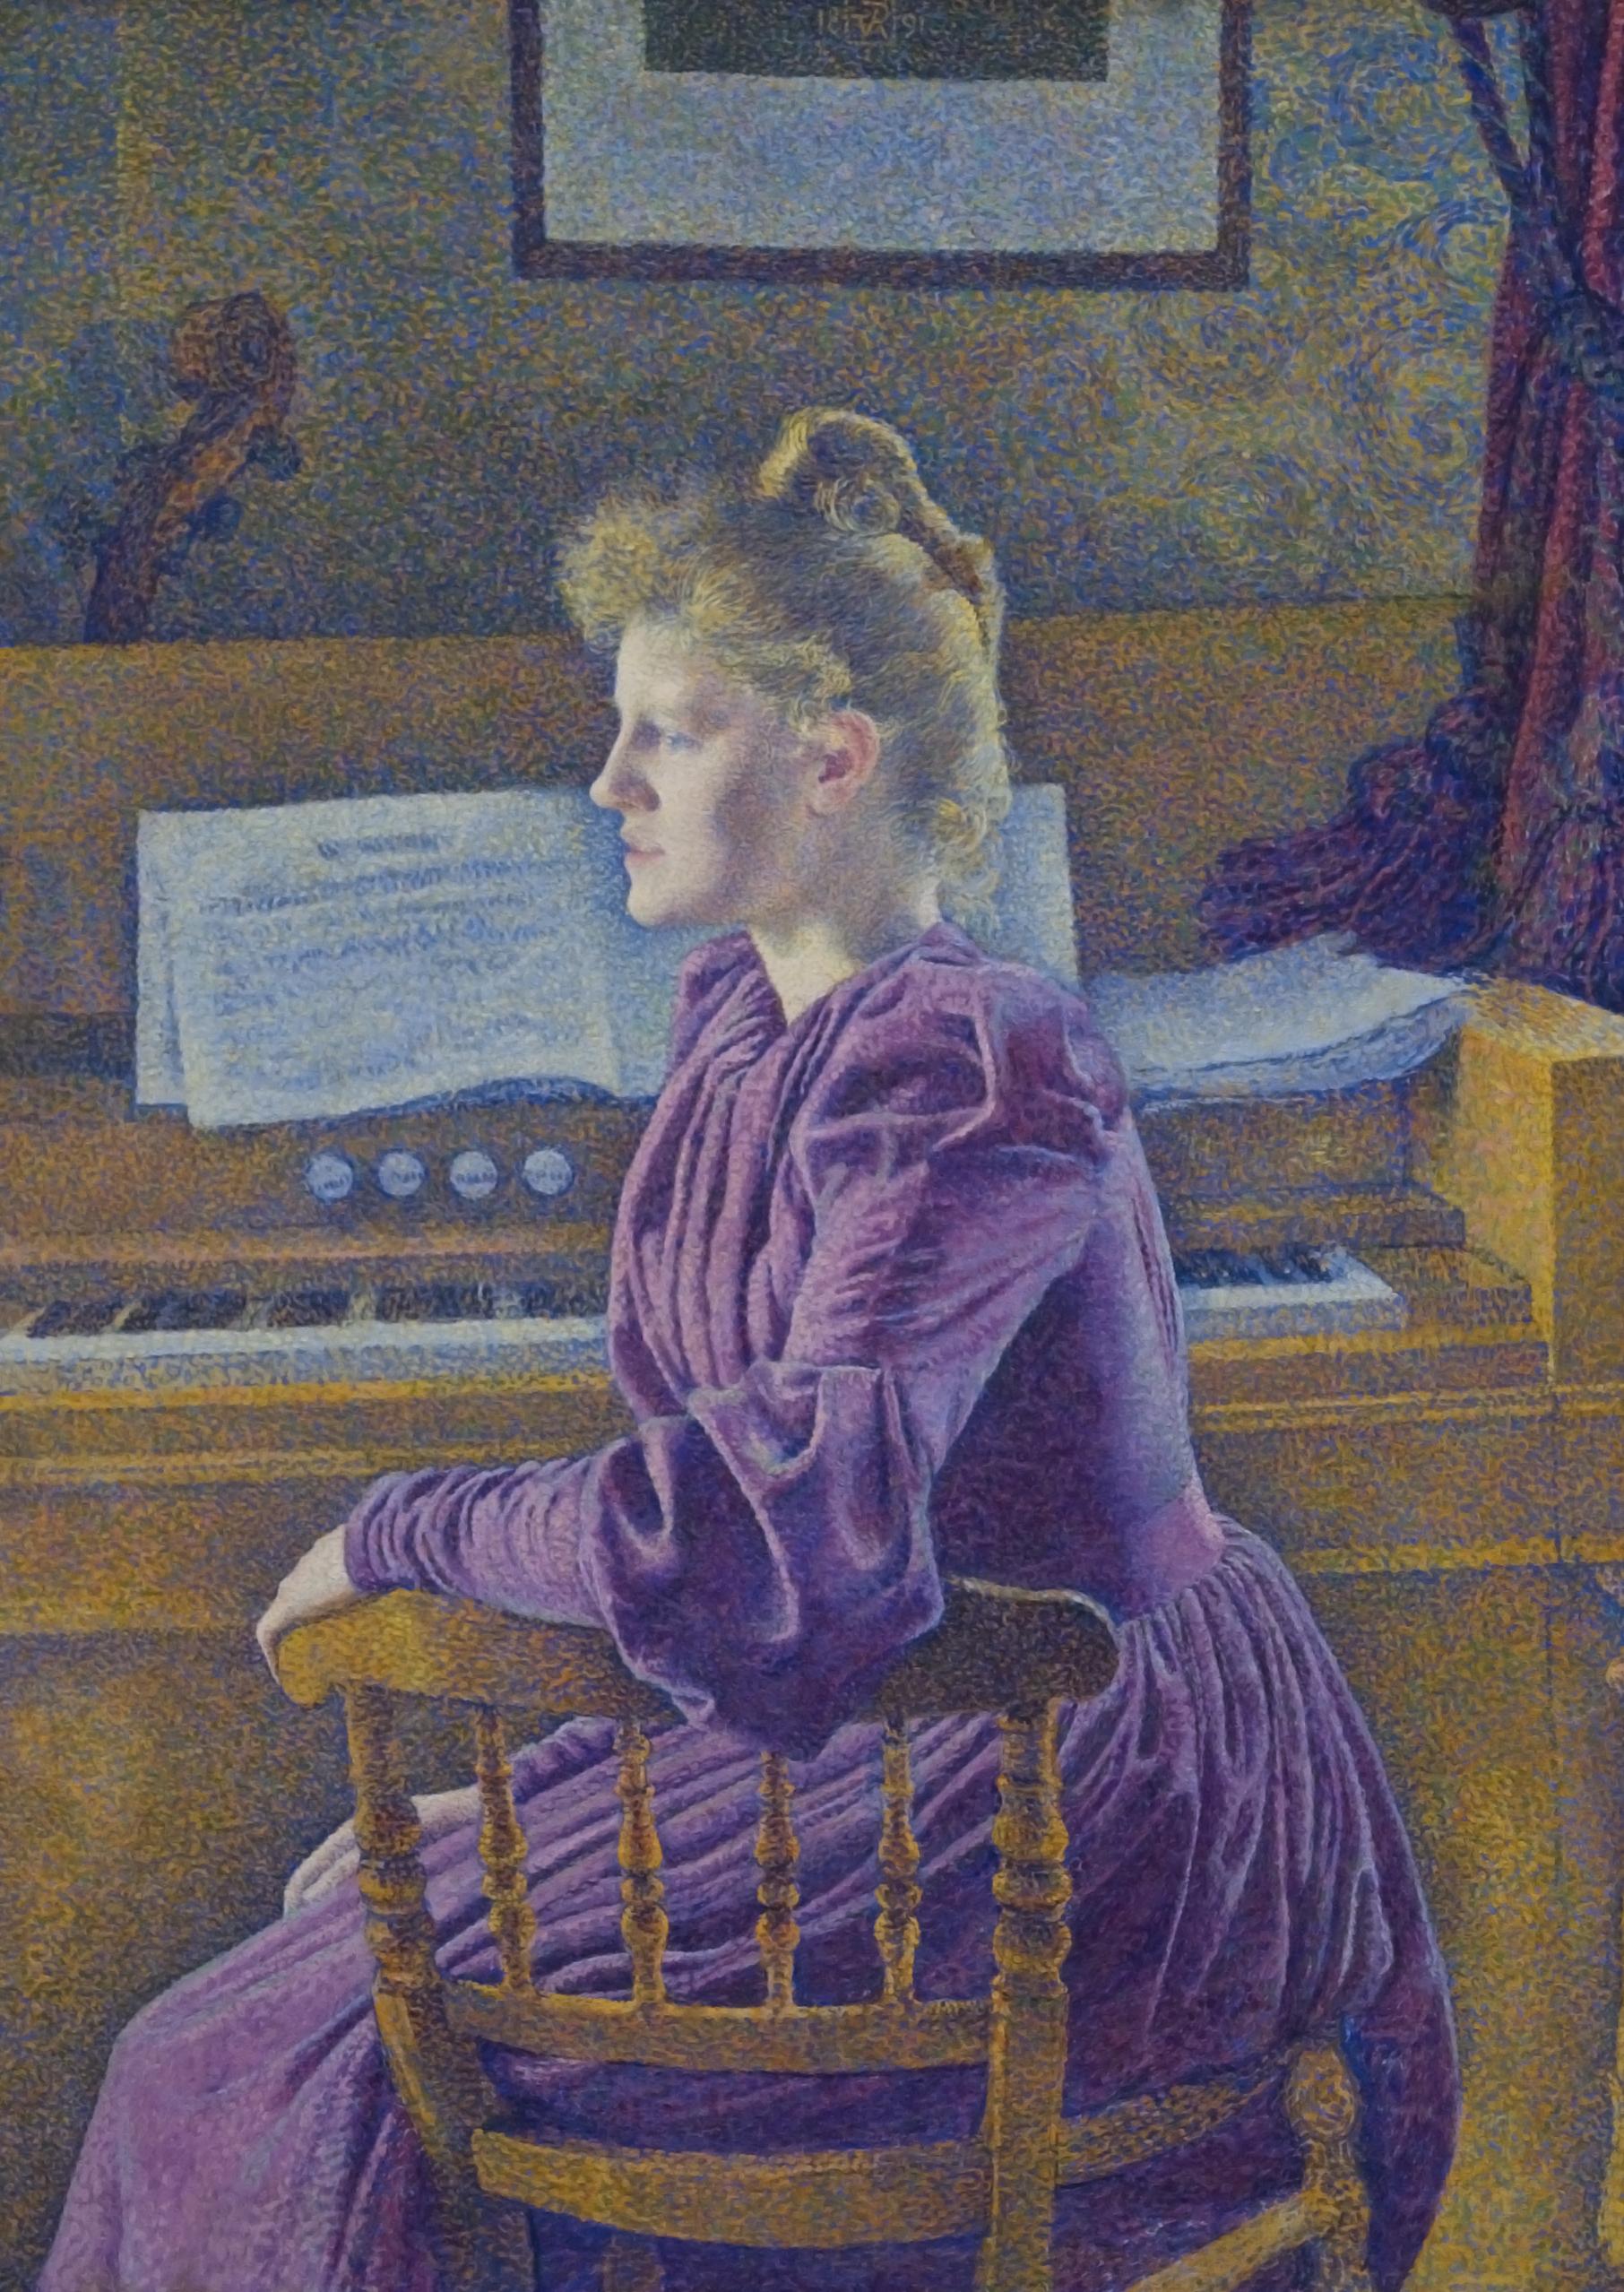 Théo van Rysselberghe - Mevrouw Henry Van de Velde-Sèthe  [1921]